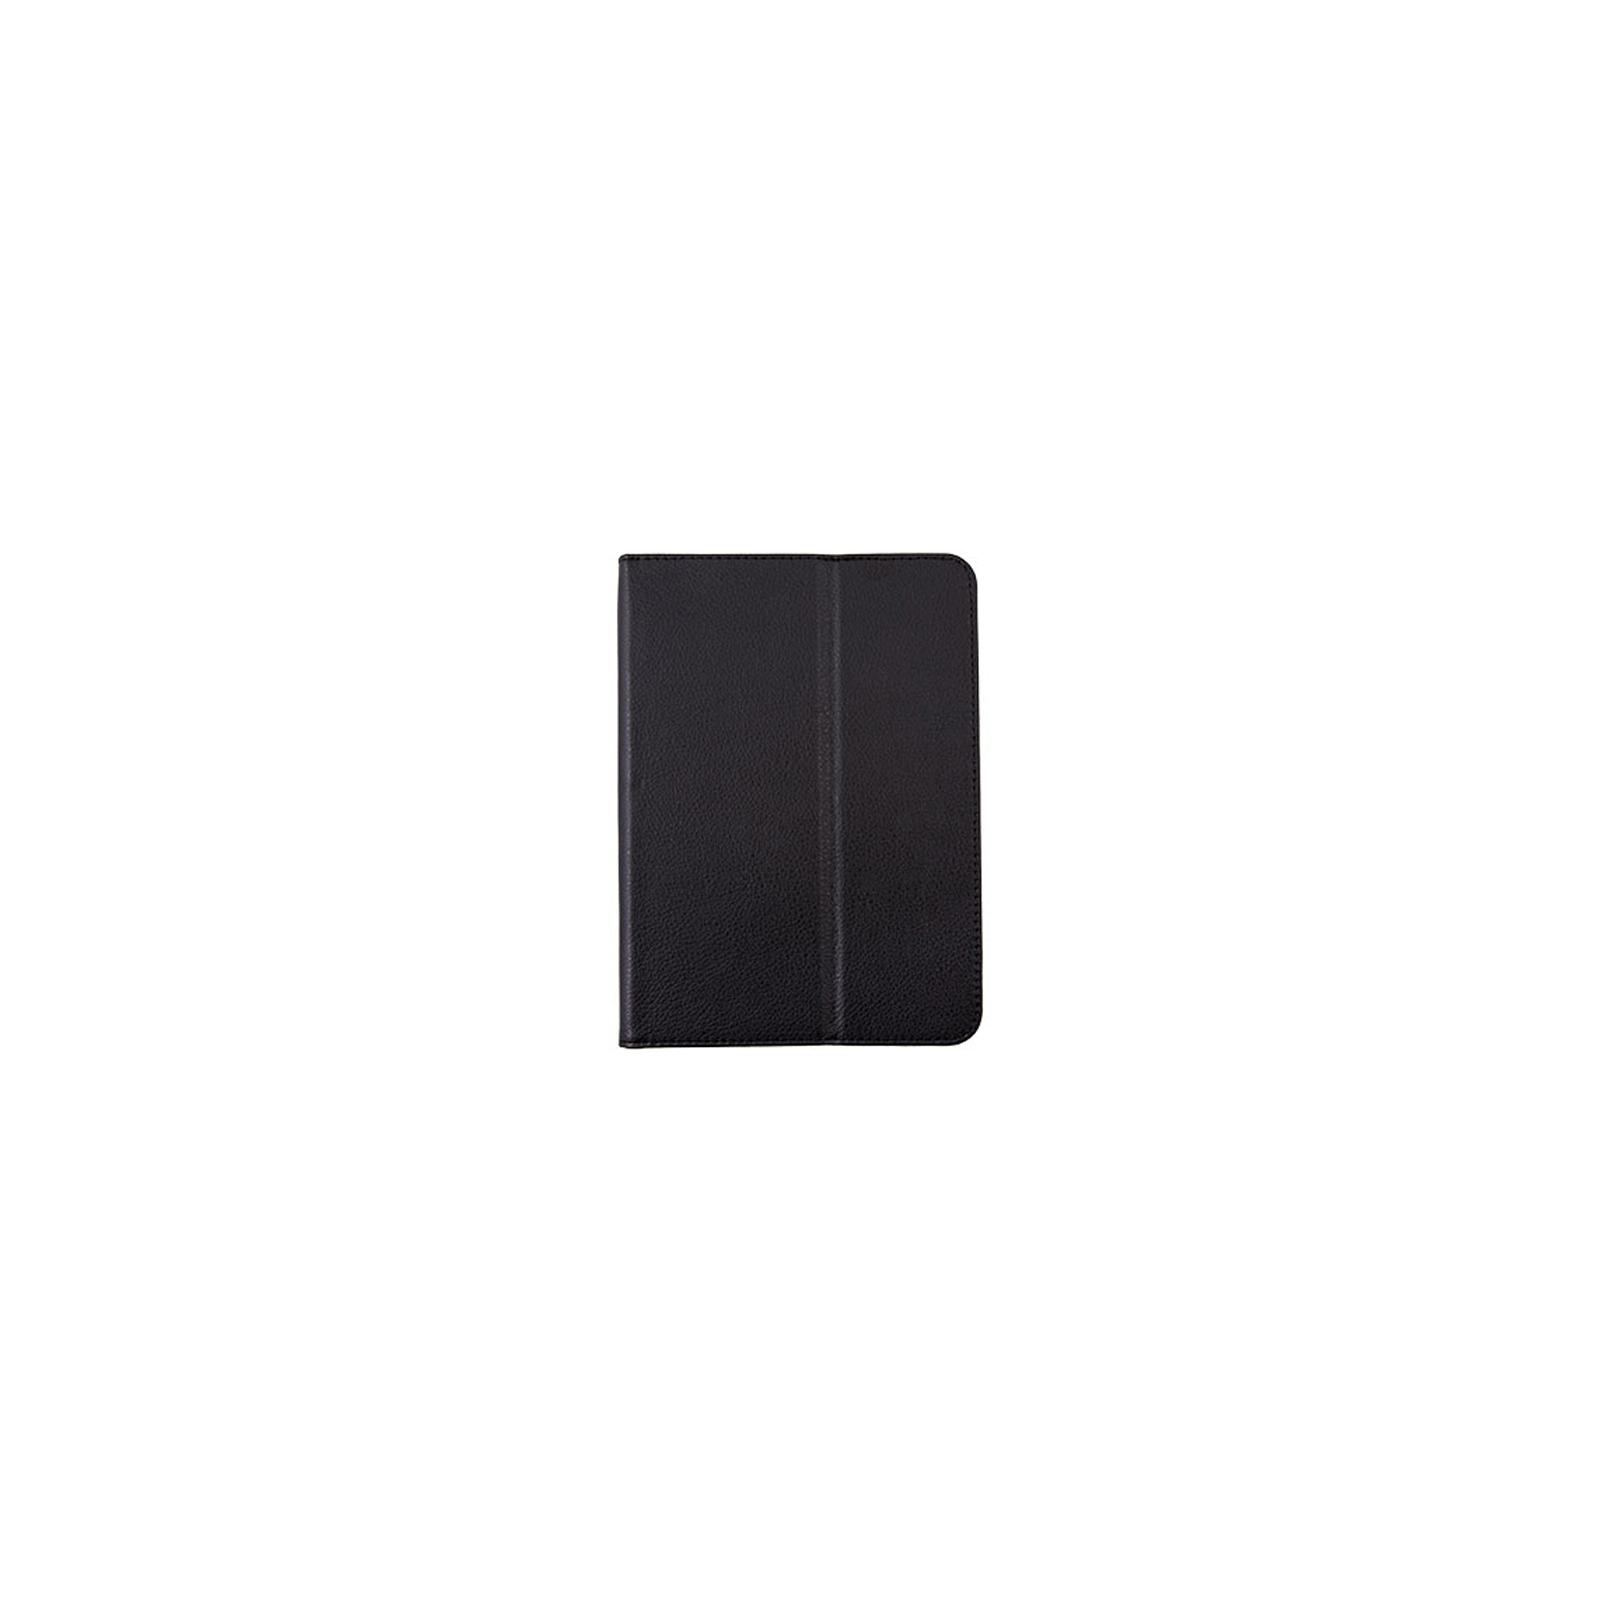 "Чехол для планшета Drobak 7"" Universal stand Black (216879)"